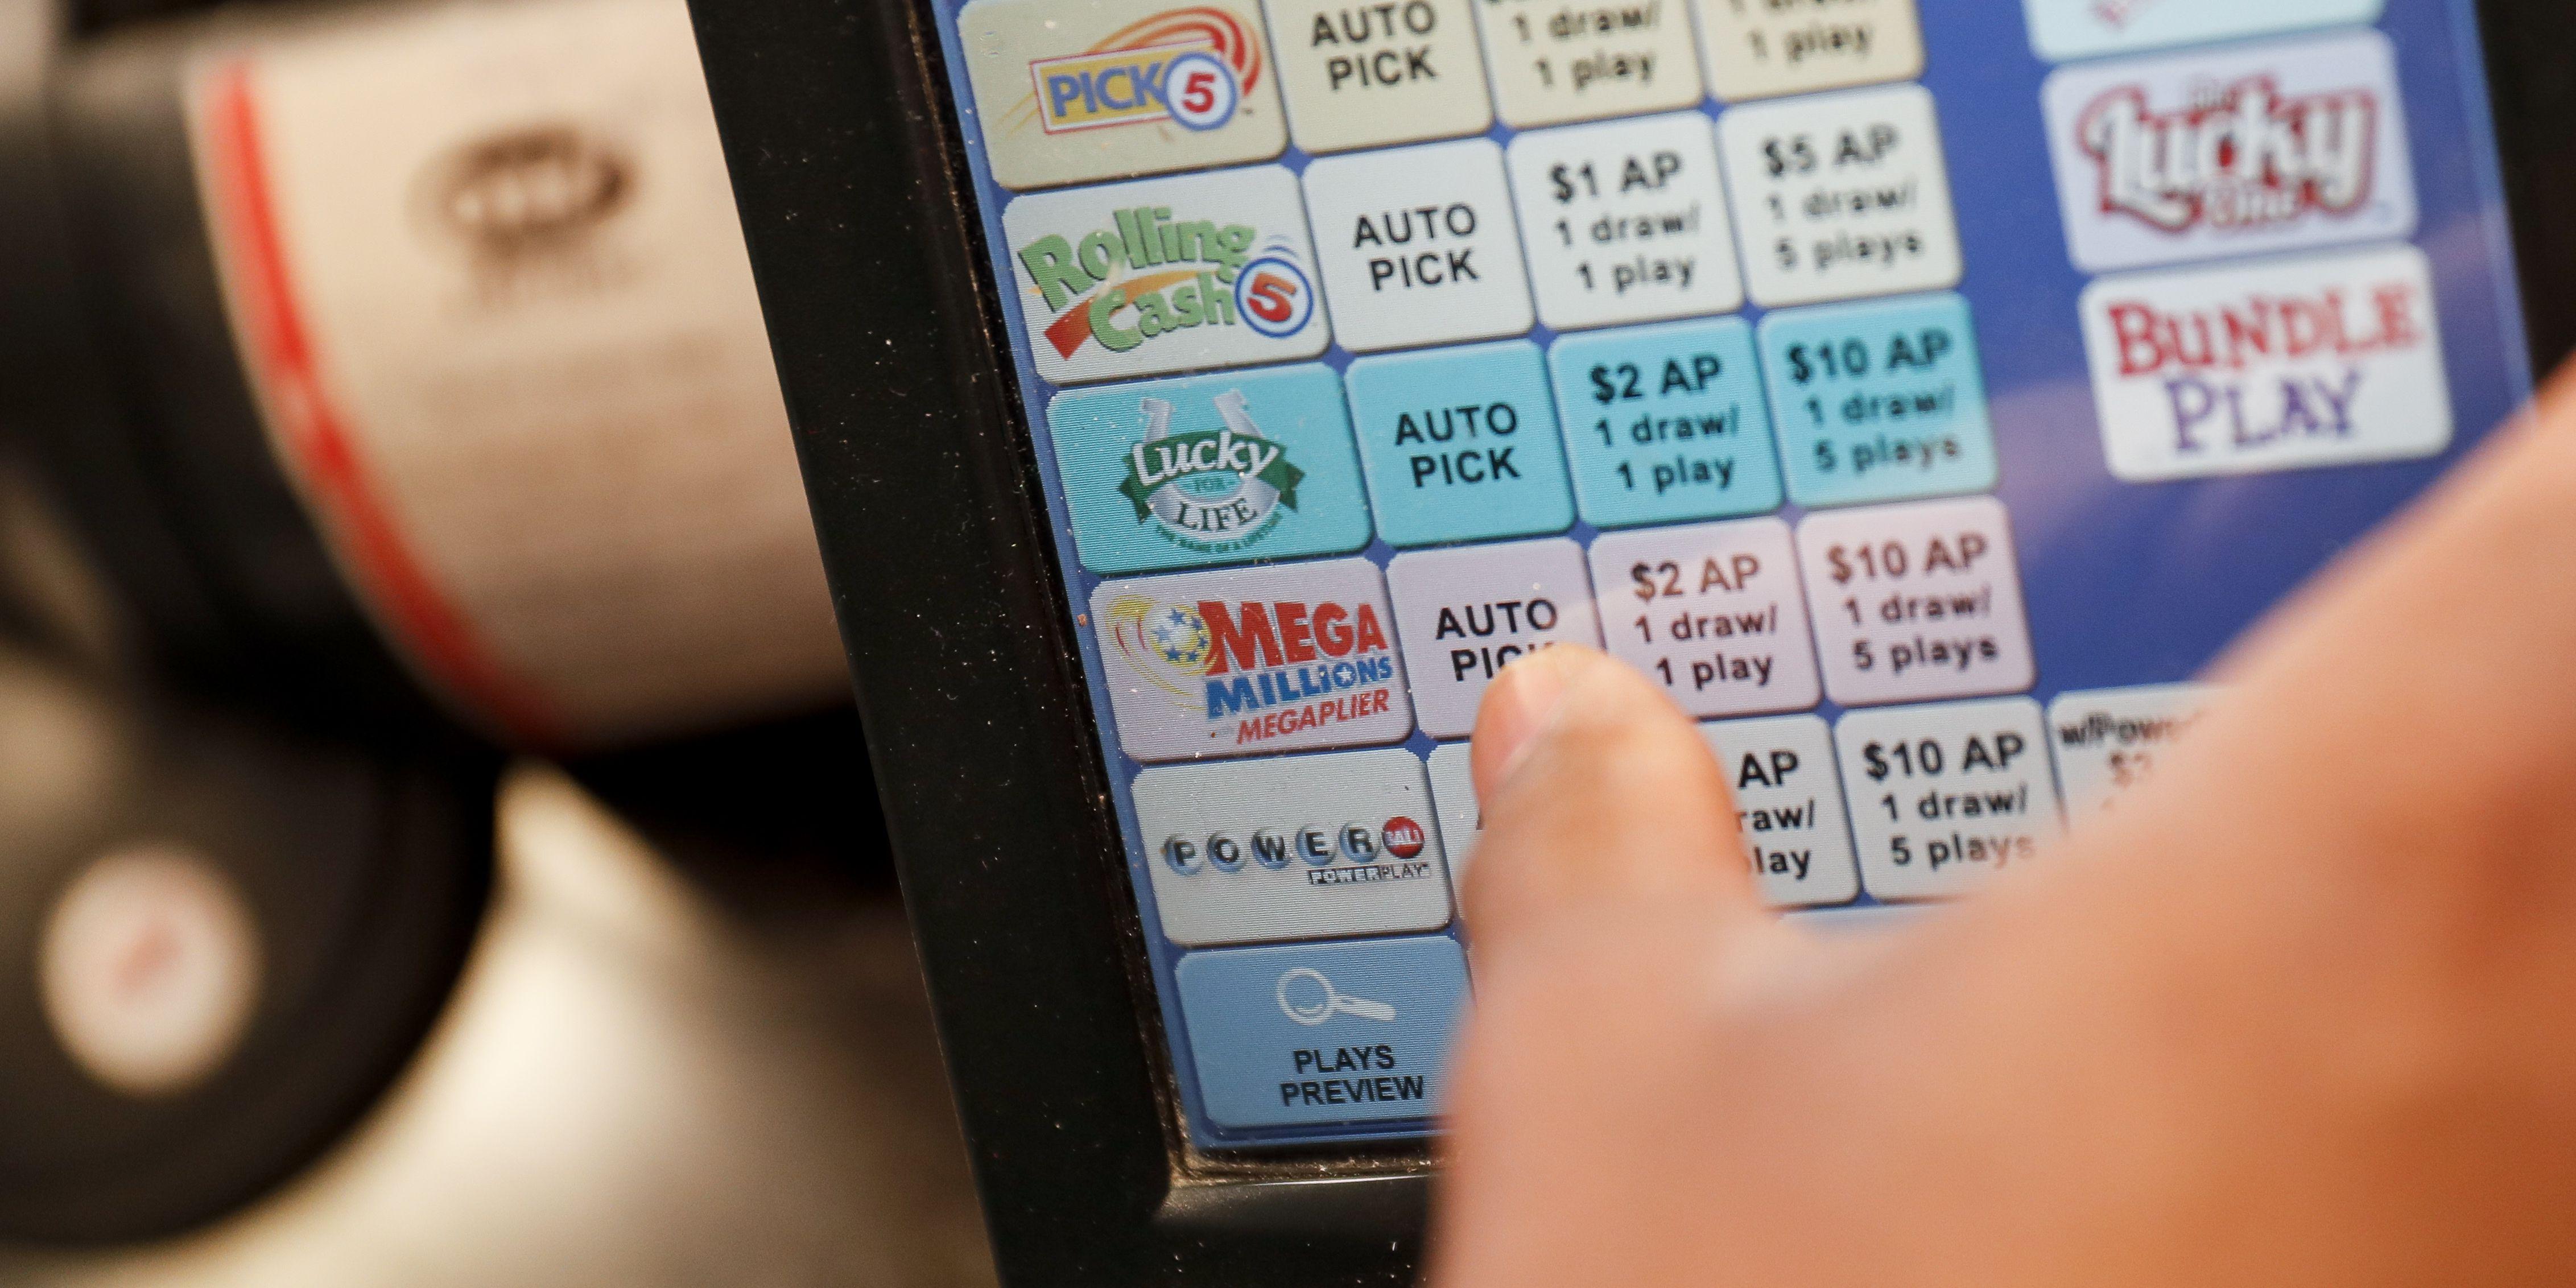 Park ranger furloughed during shutdown wins lottery